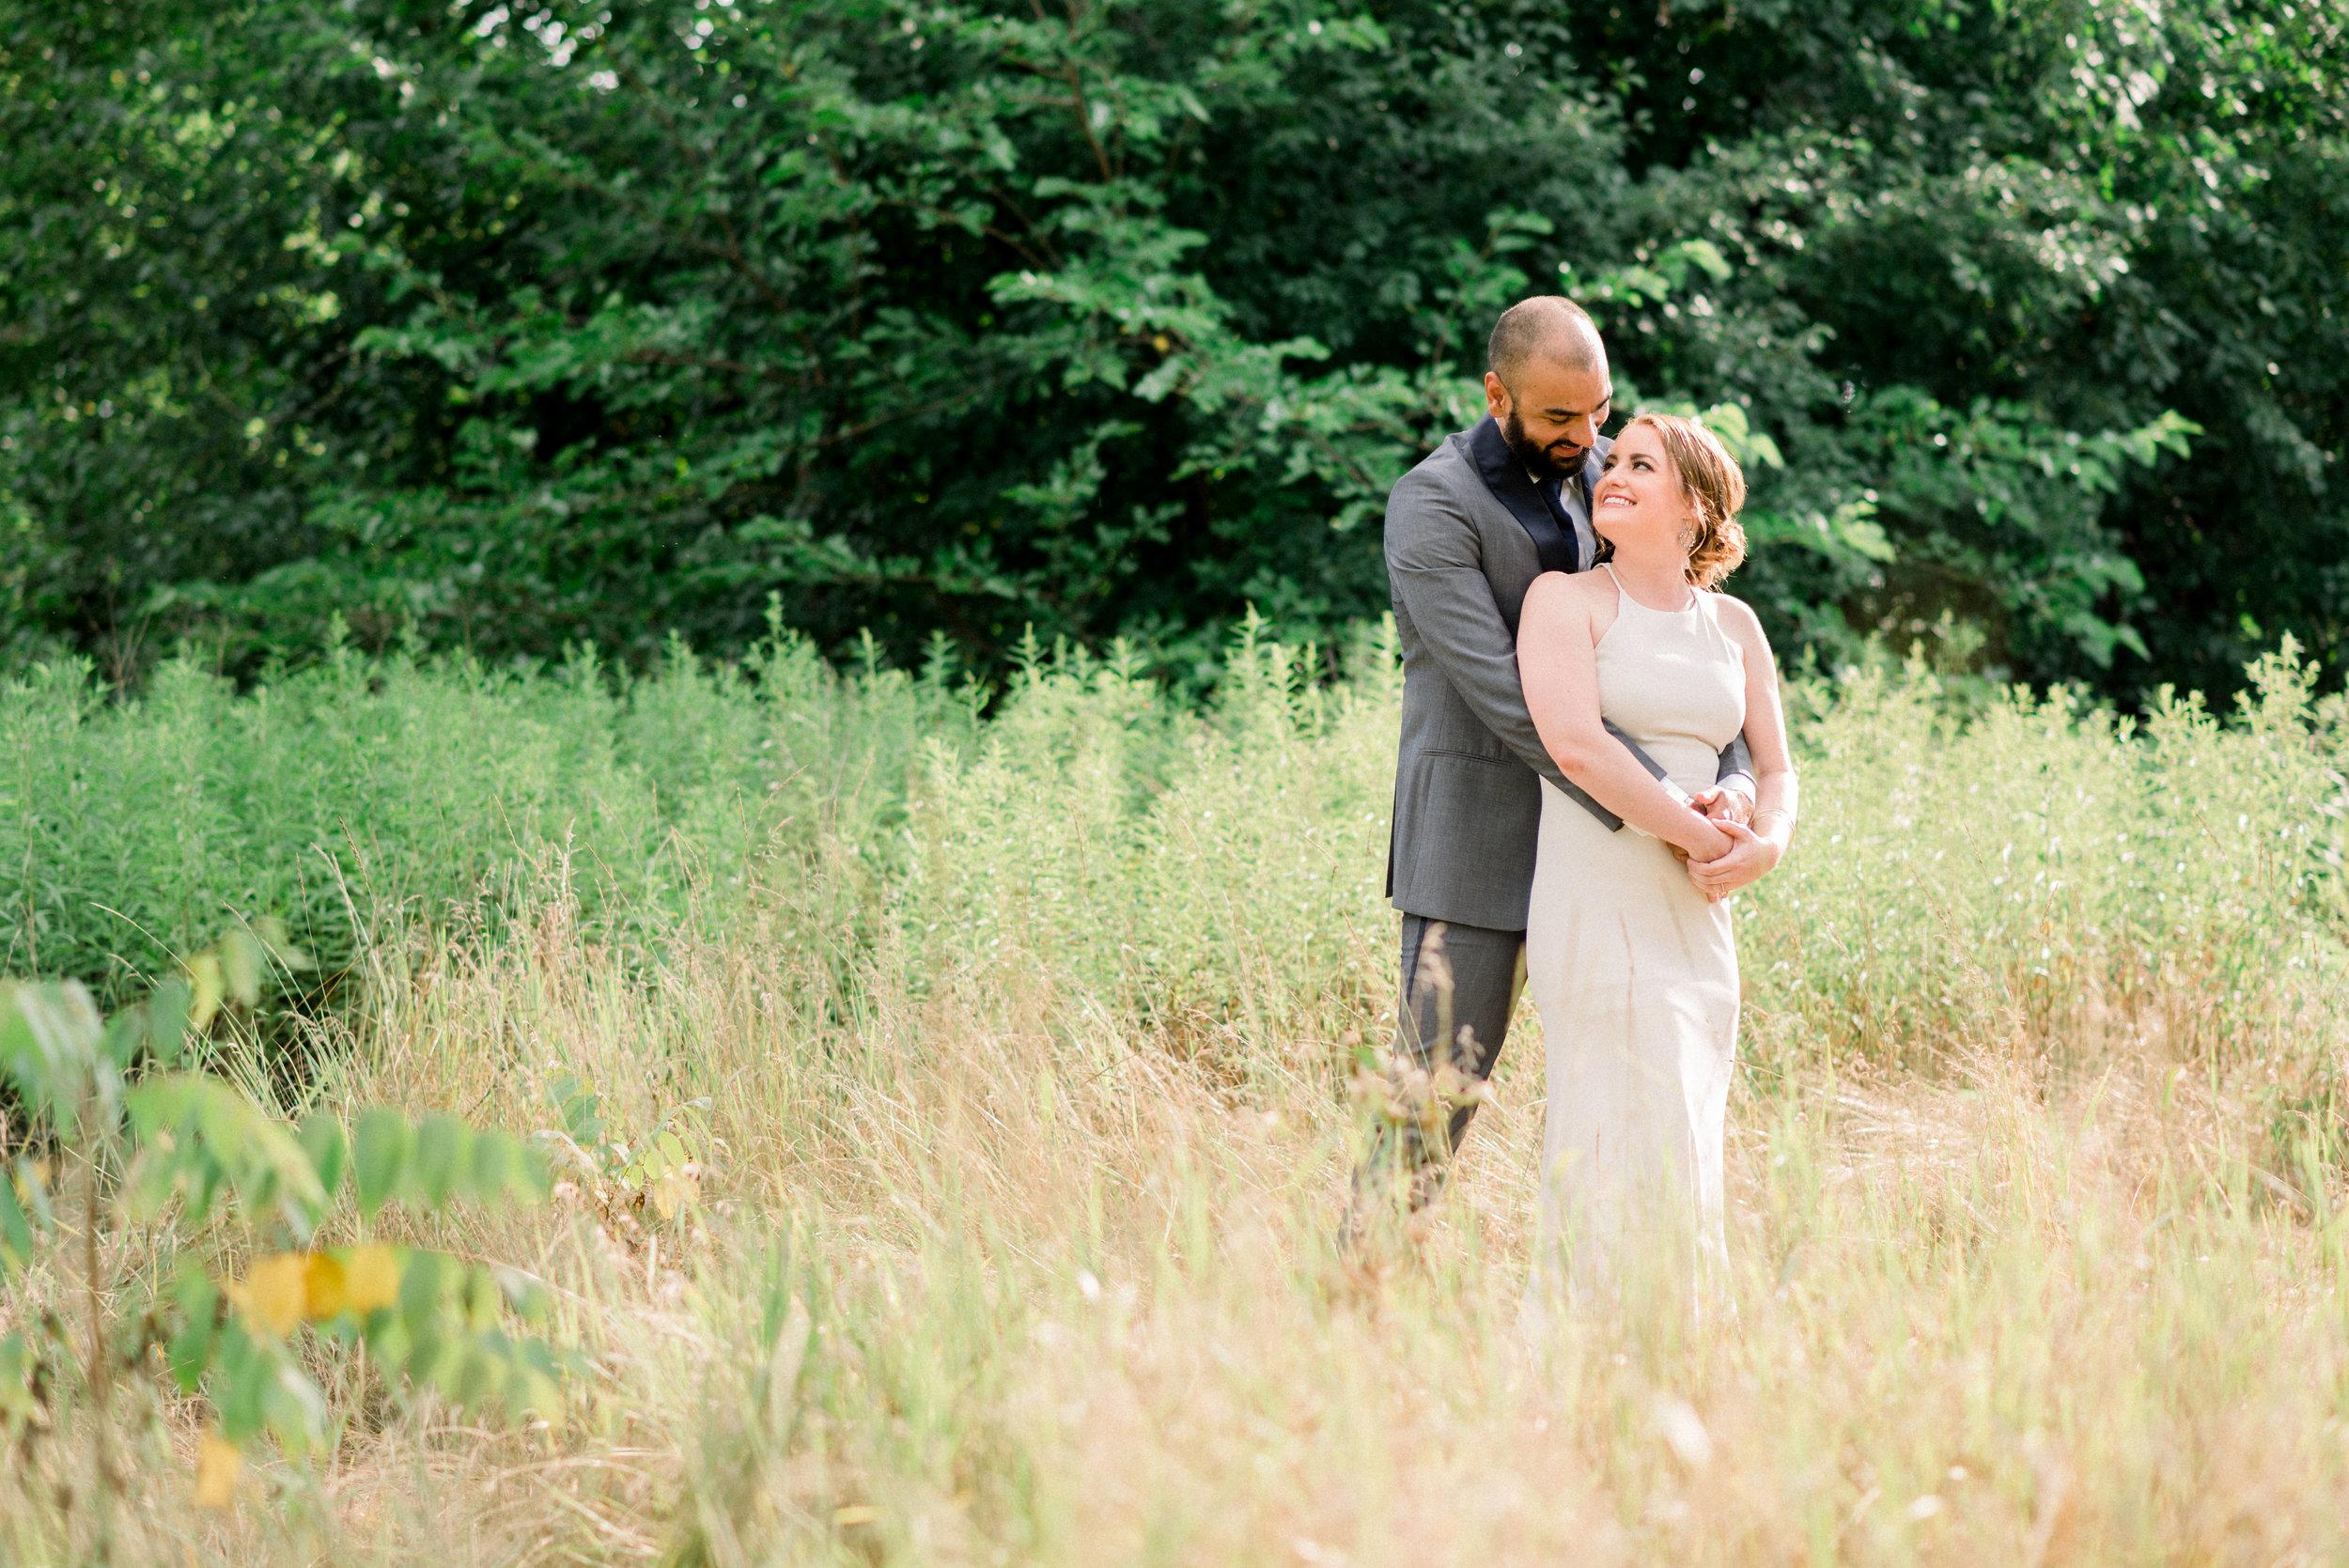 Wood-Violets-Vintage-Brewing-Company-Styled-Shoot-Blu-Moose-Photography-Caitlyn-Jason-Wedding-Photos-23.jpg